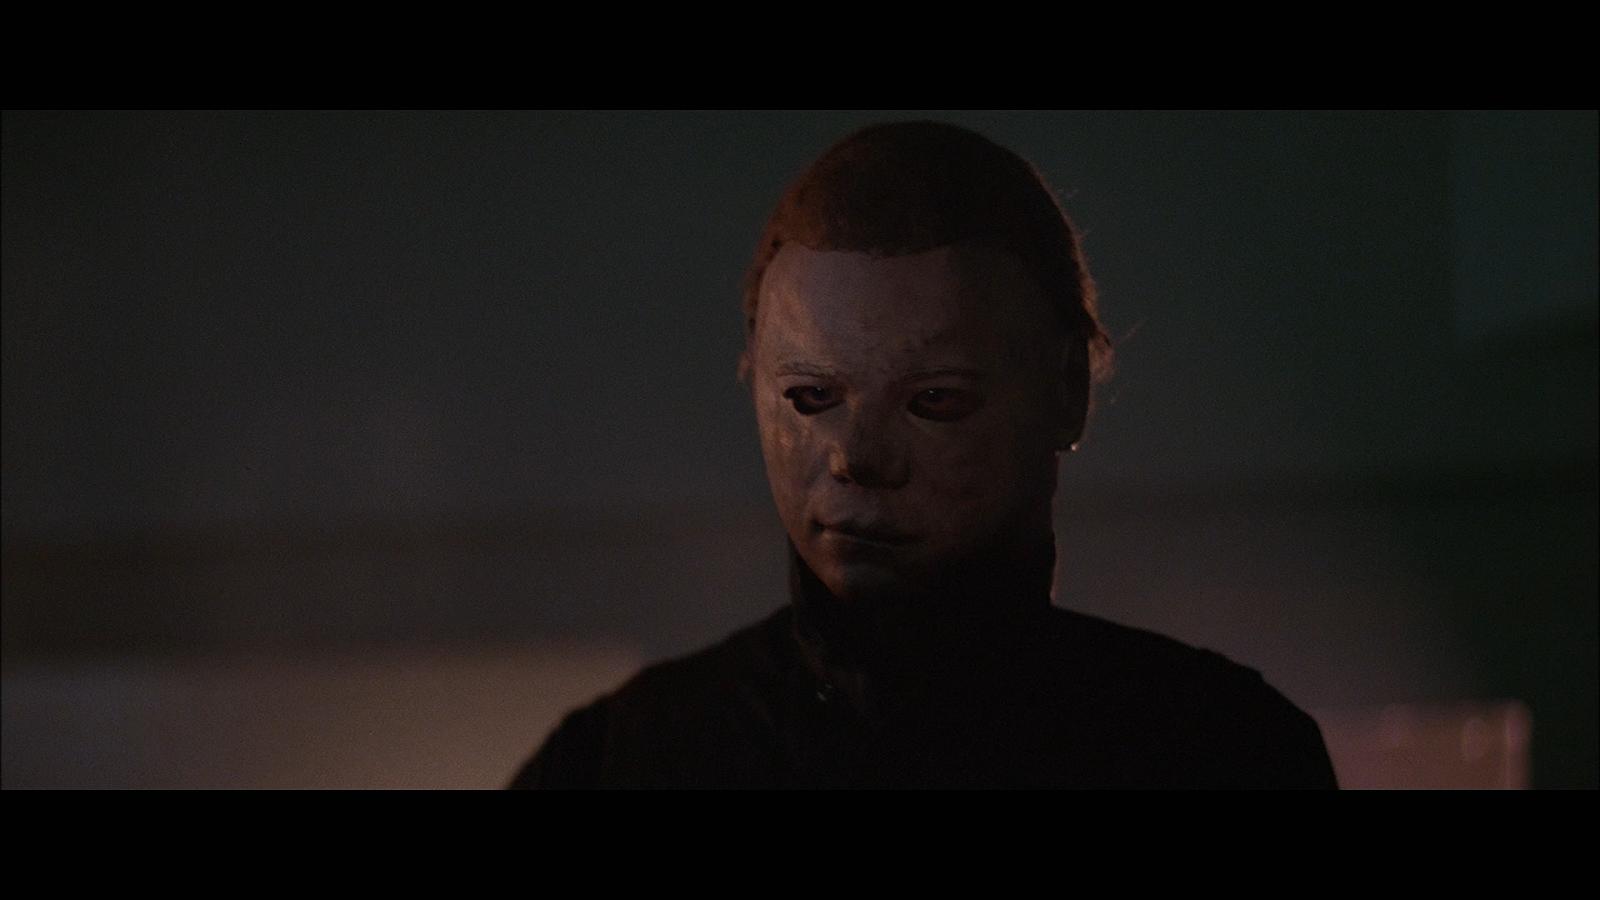 Image - Halloween ii 1981 6.png | Horror Film Wiki | FANDOM powered ...